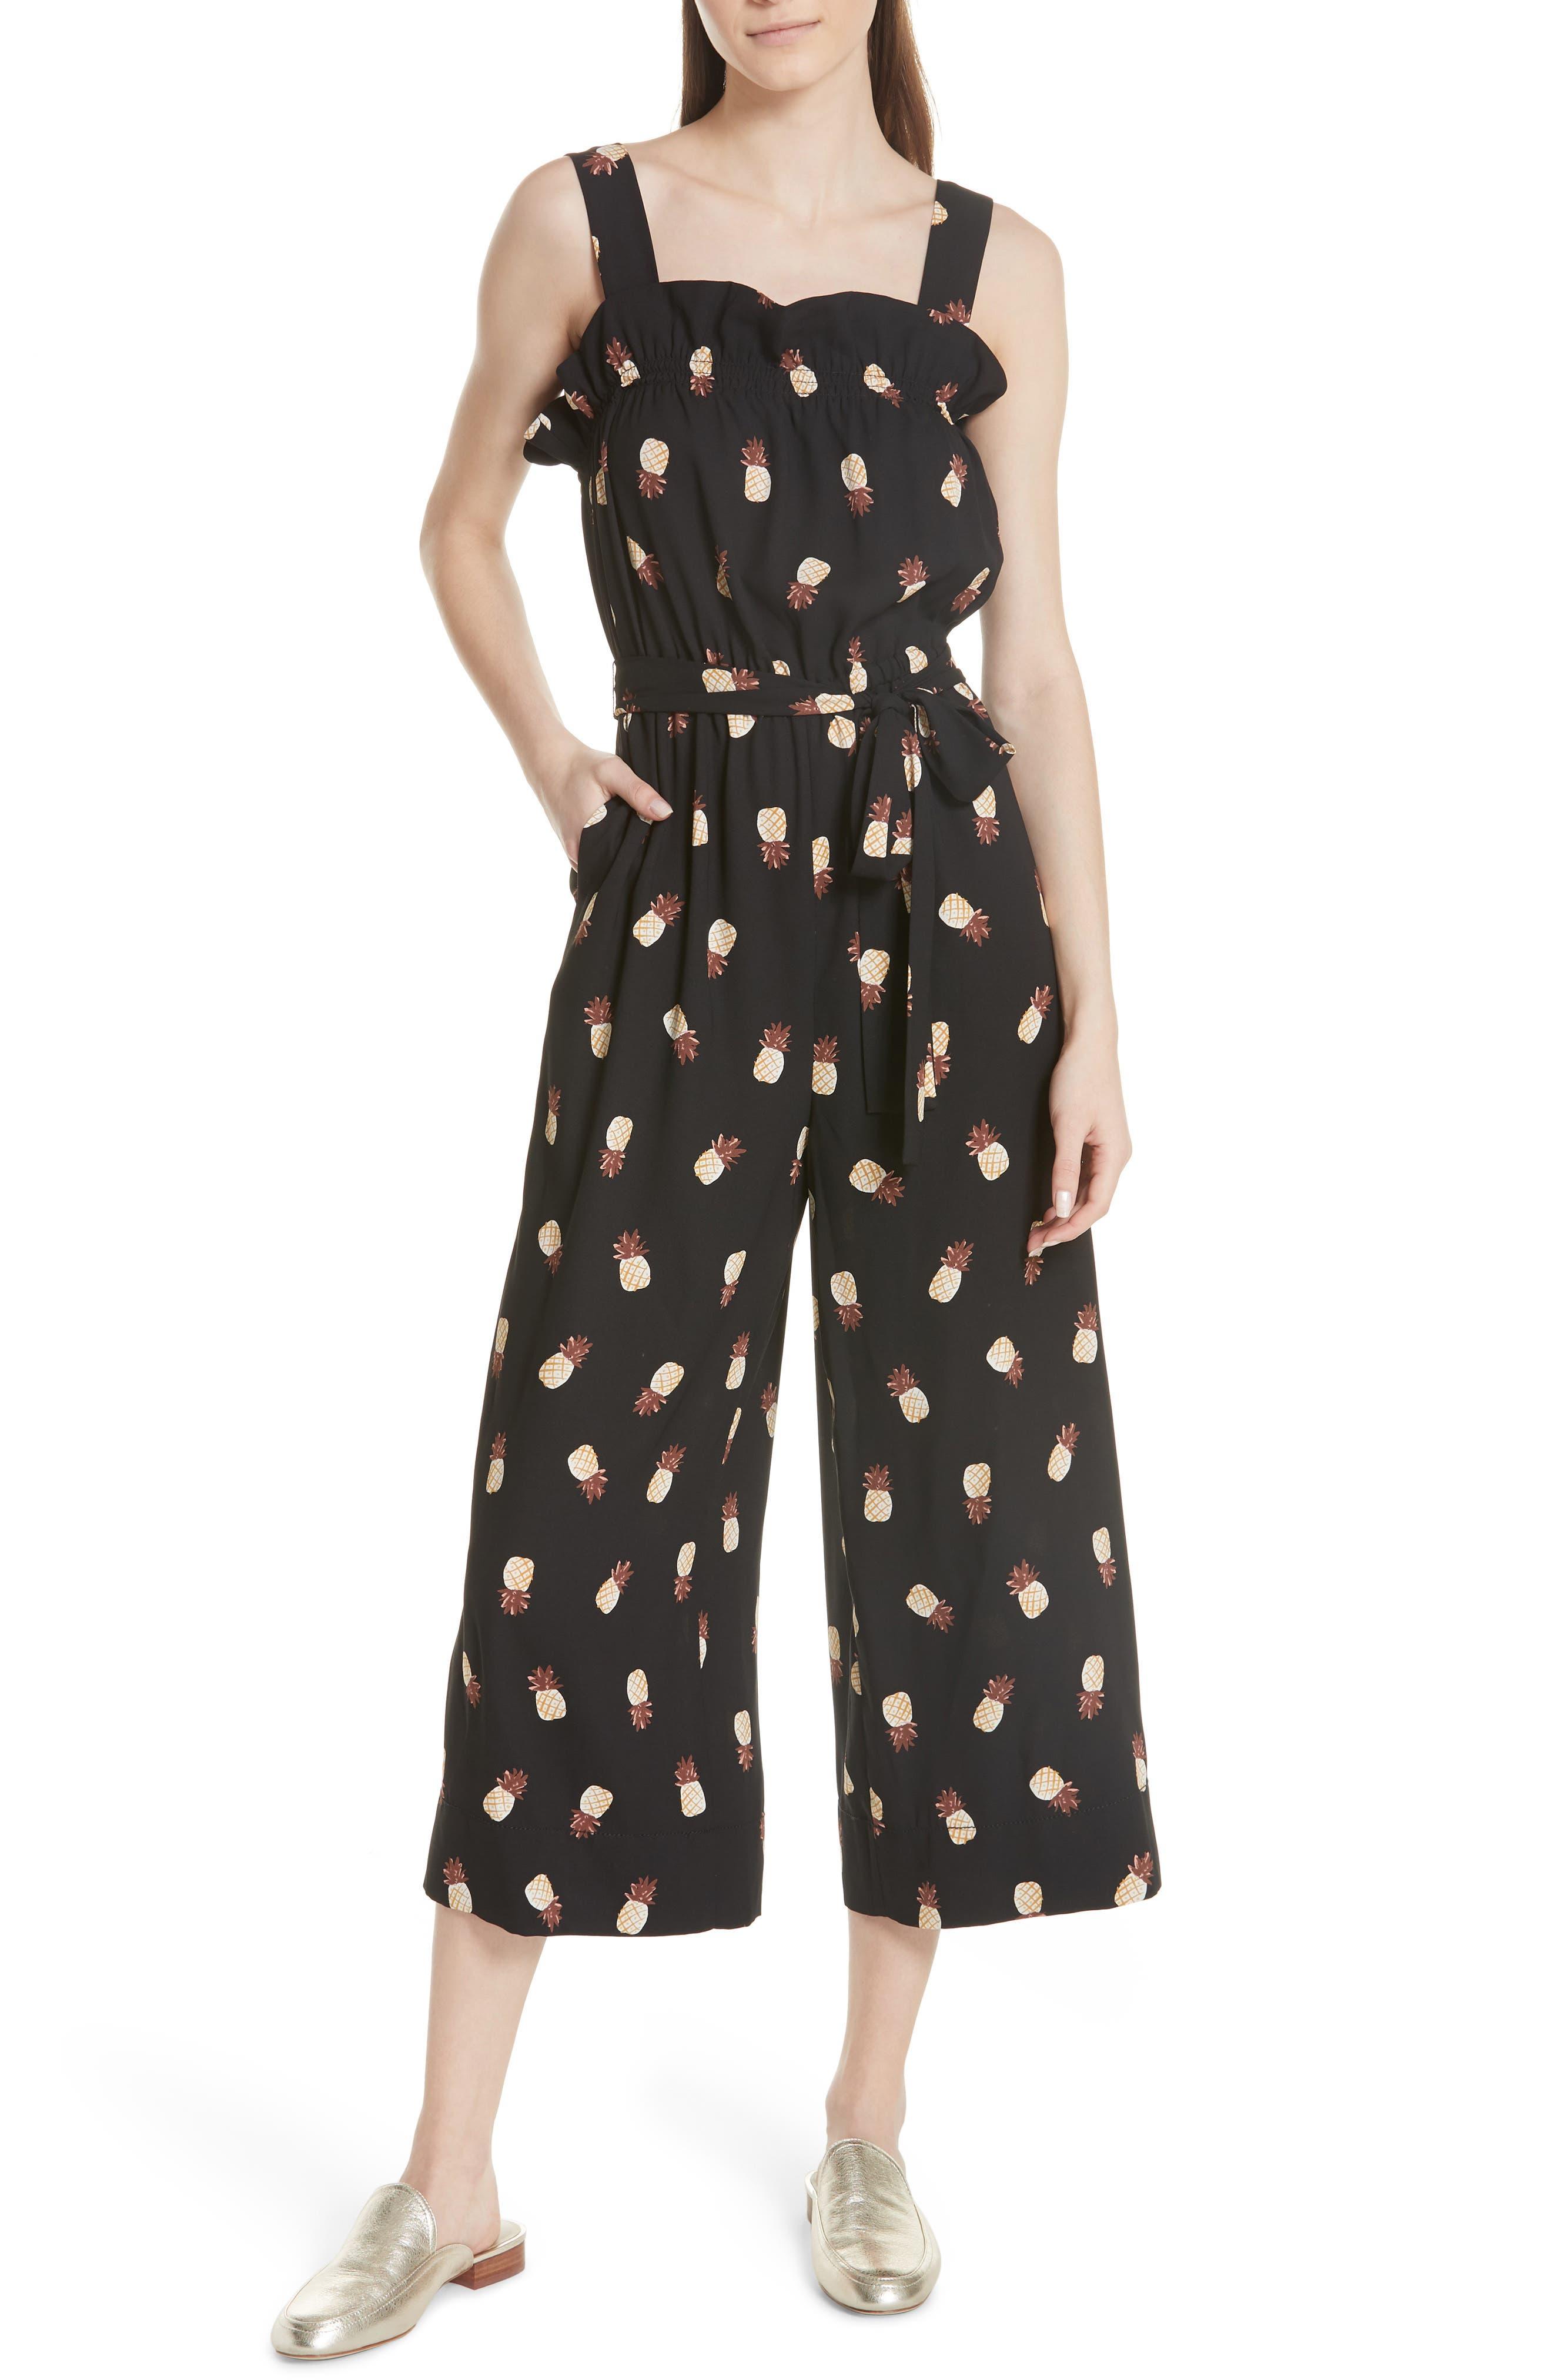 KATE SPADE NEW YORK,                             pineapple wide leg crop jumpsuit,                             Main thumbnail 1, color,                             001